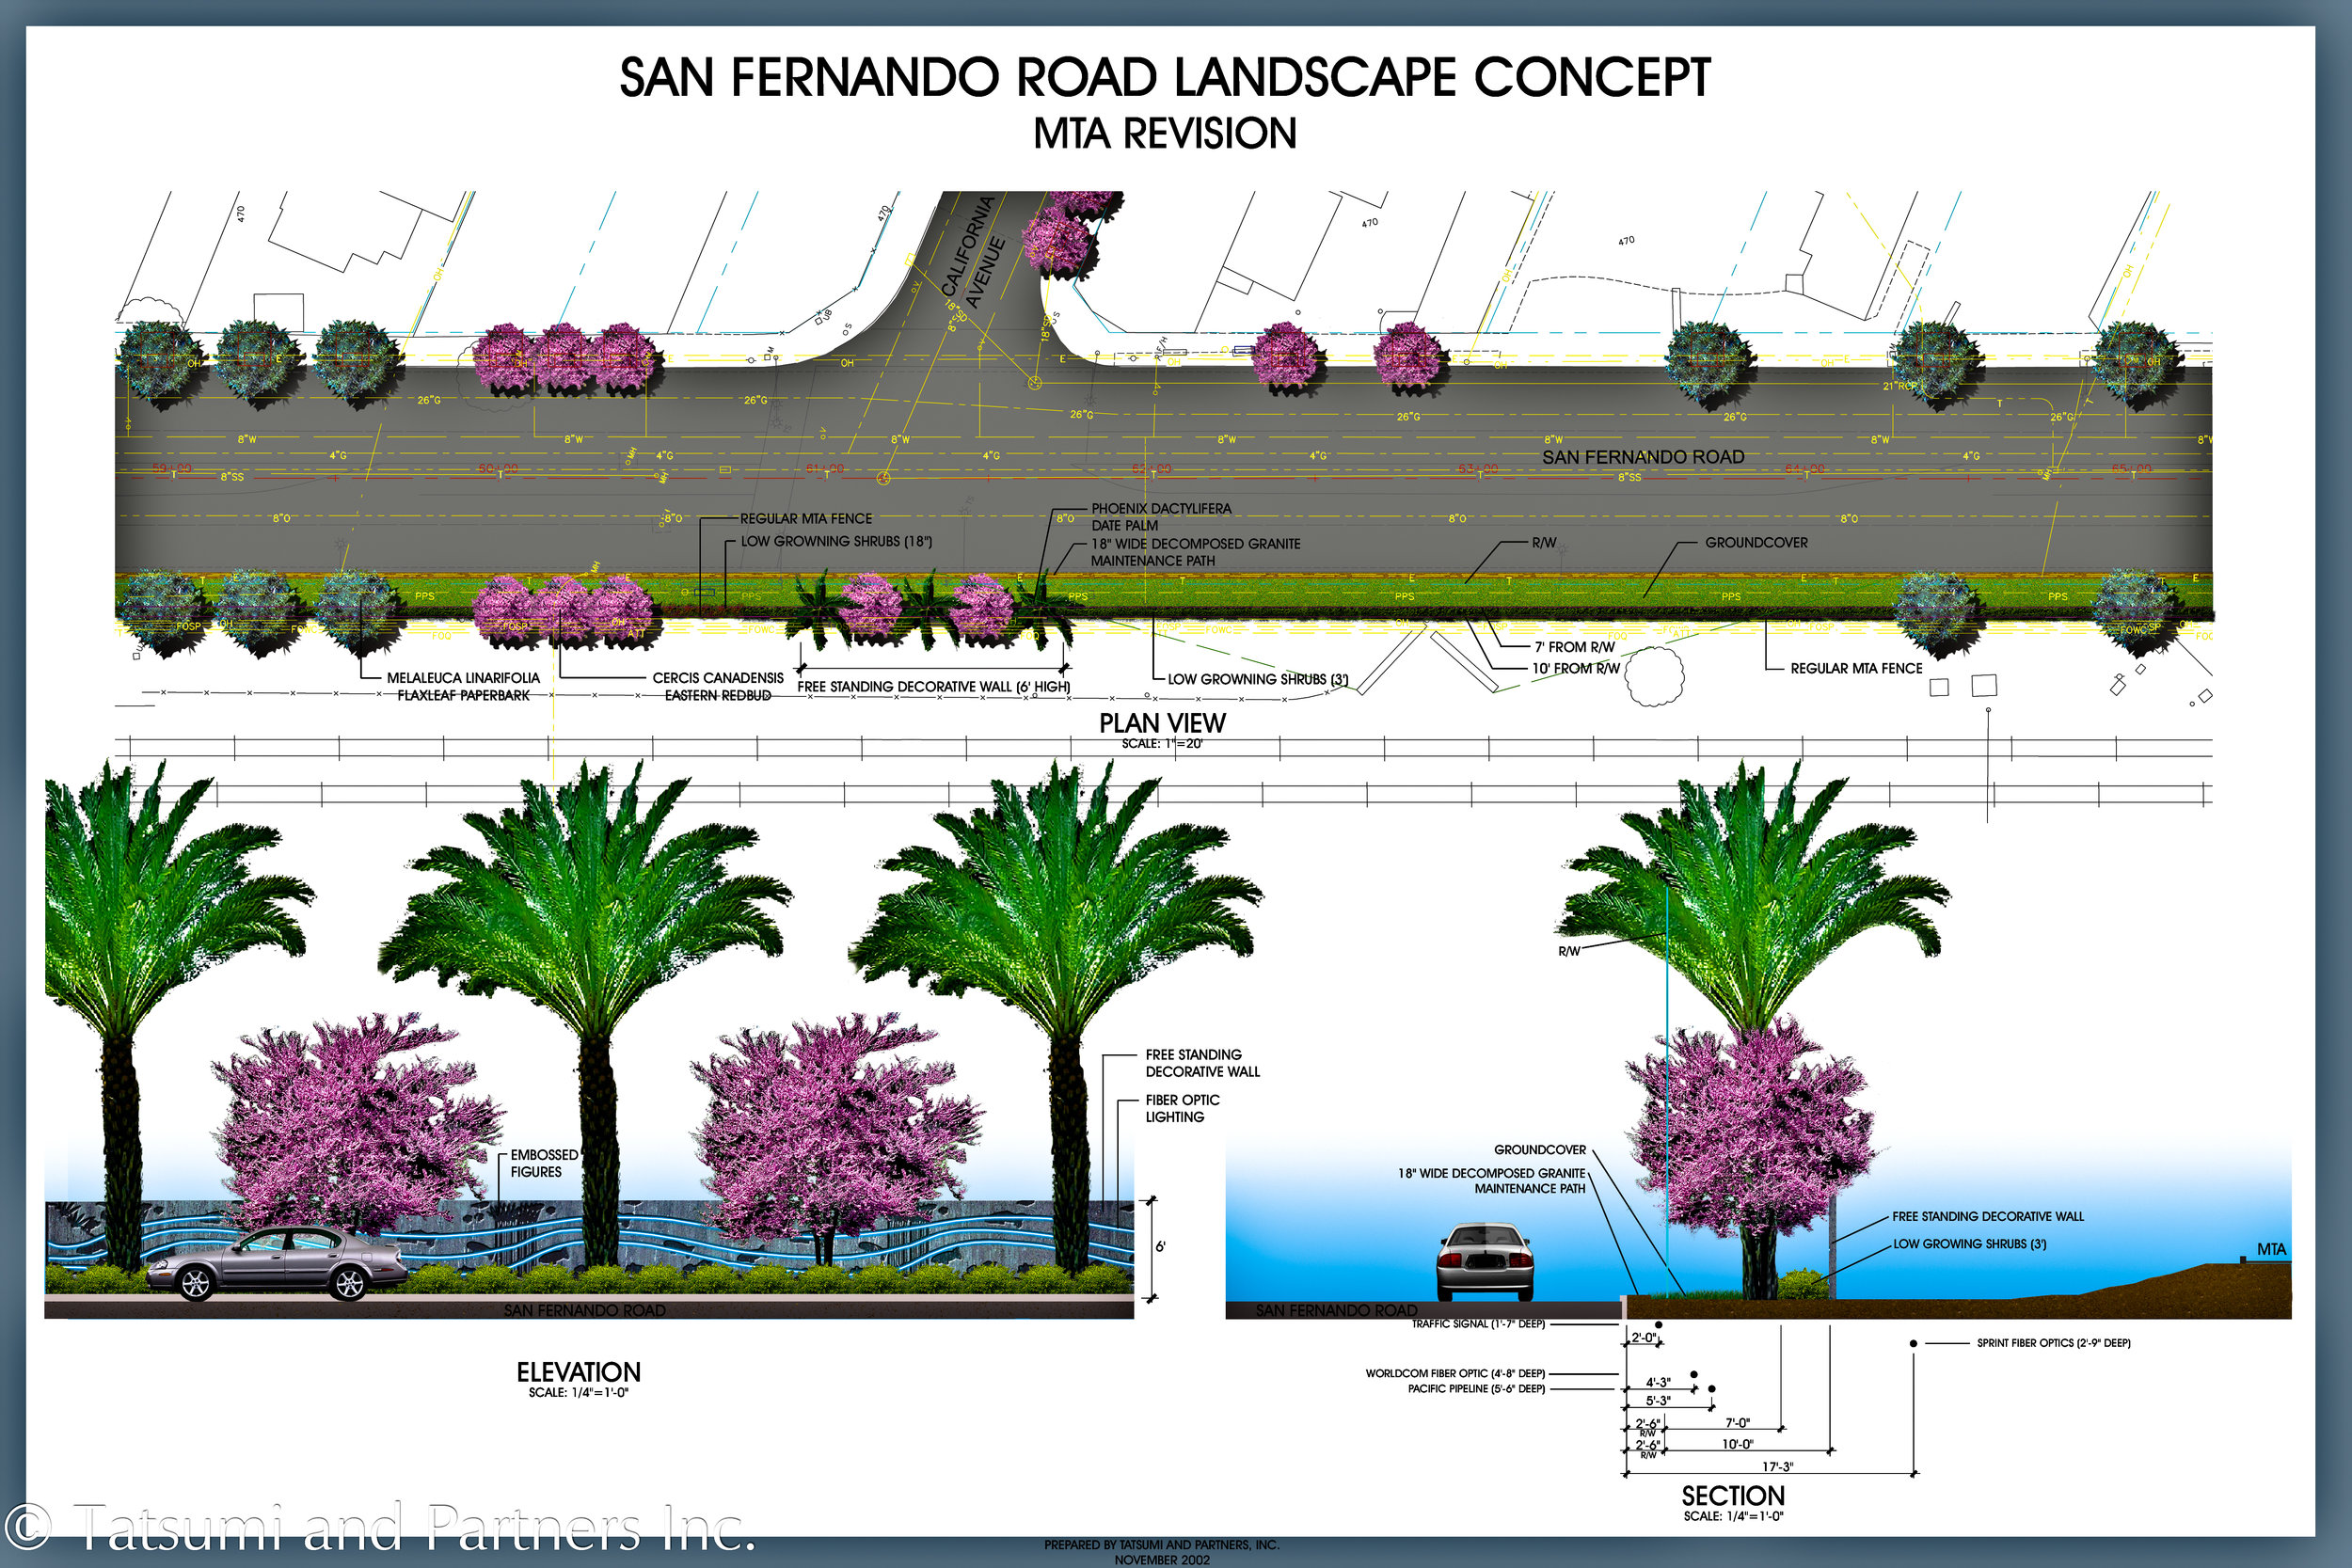 concept2 elevation.jpg